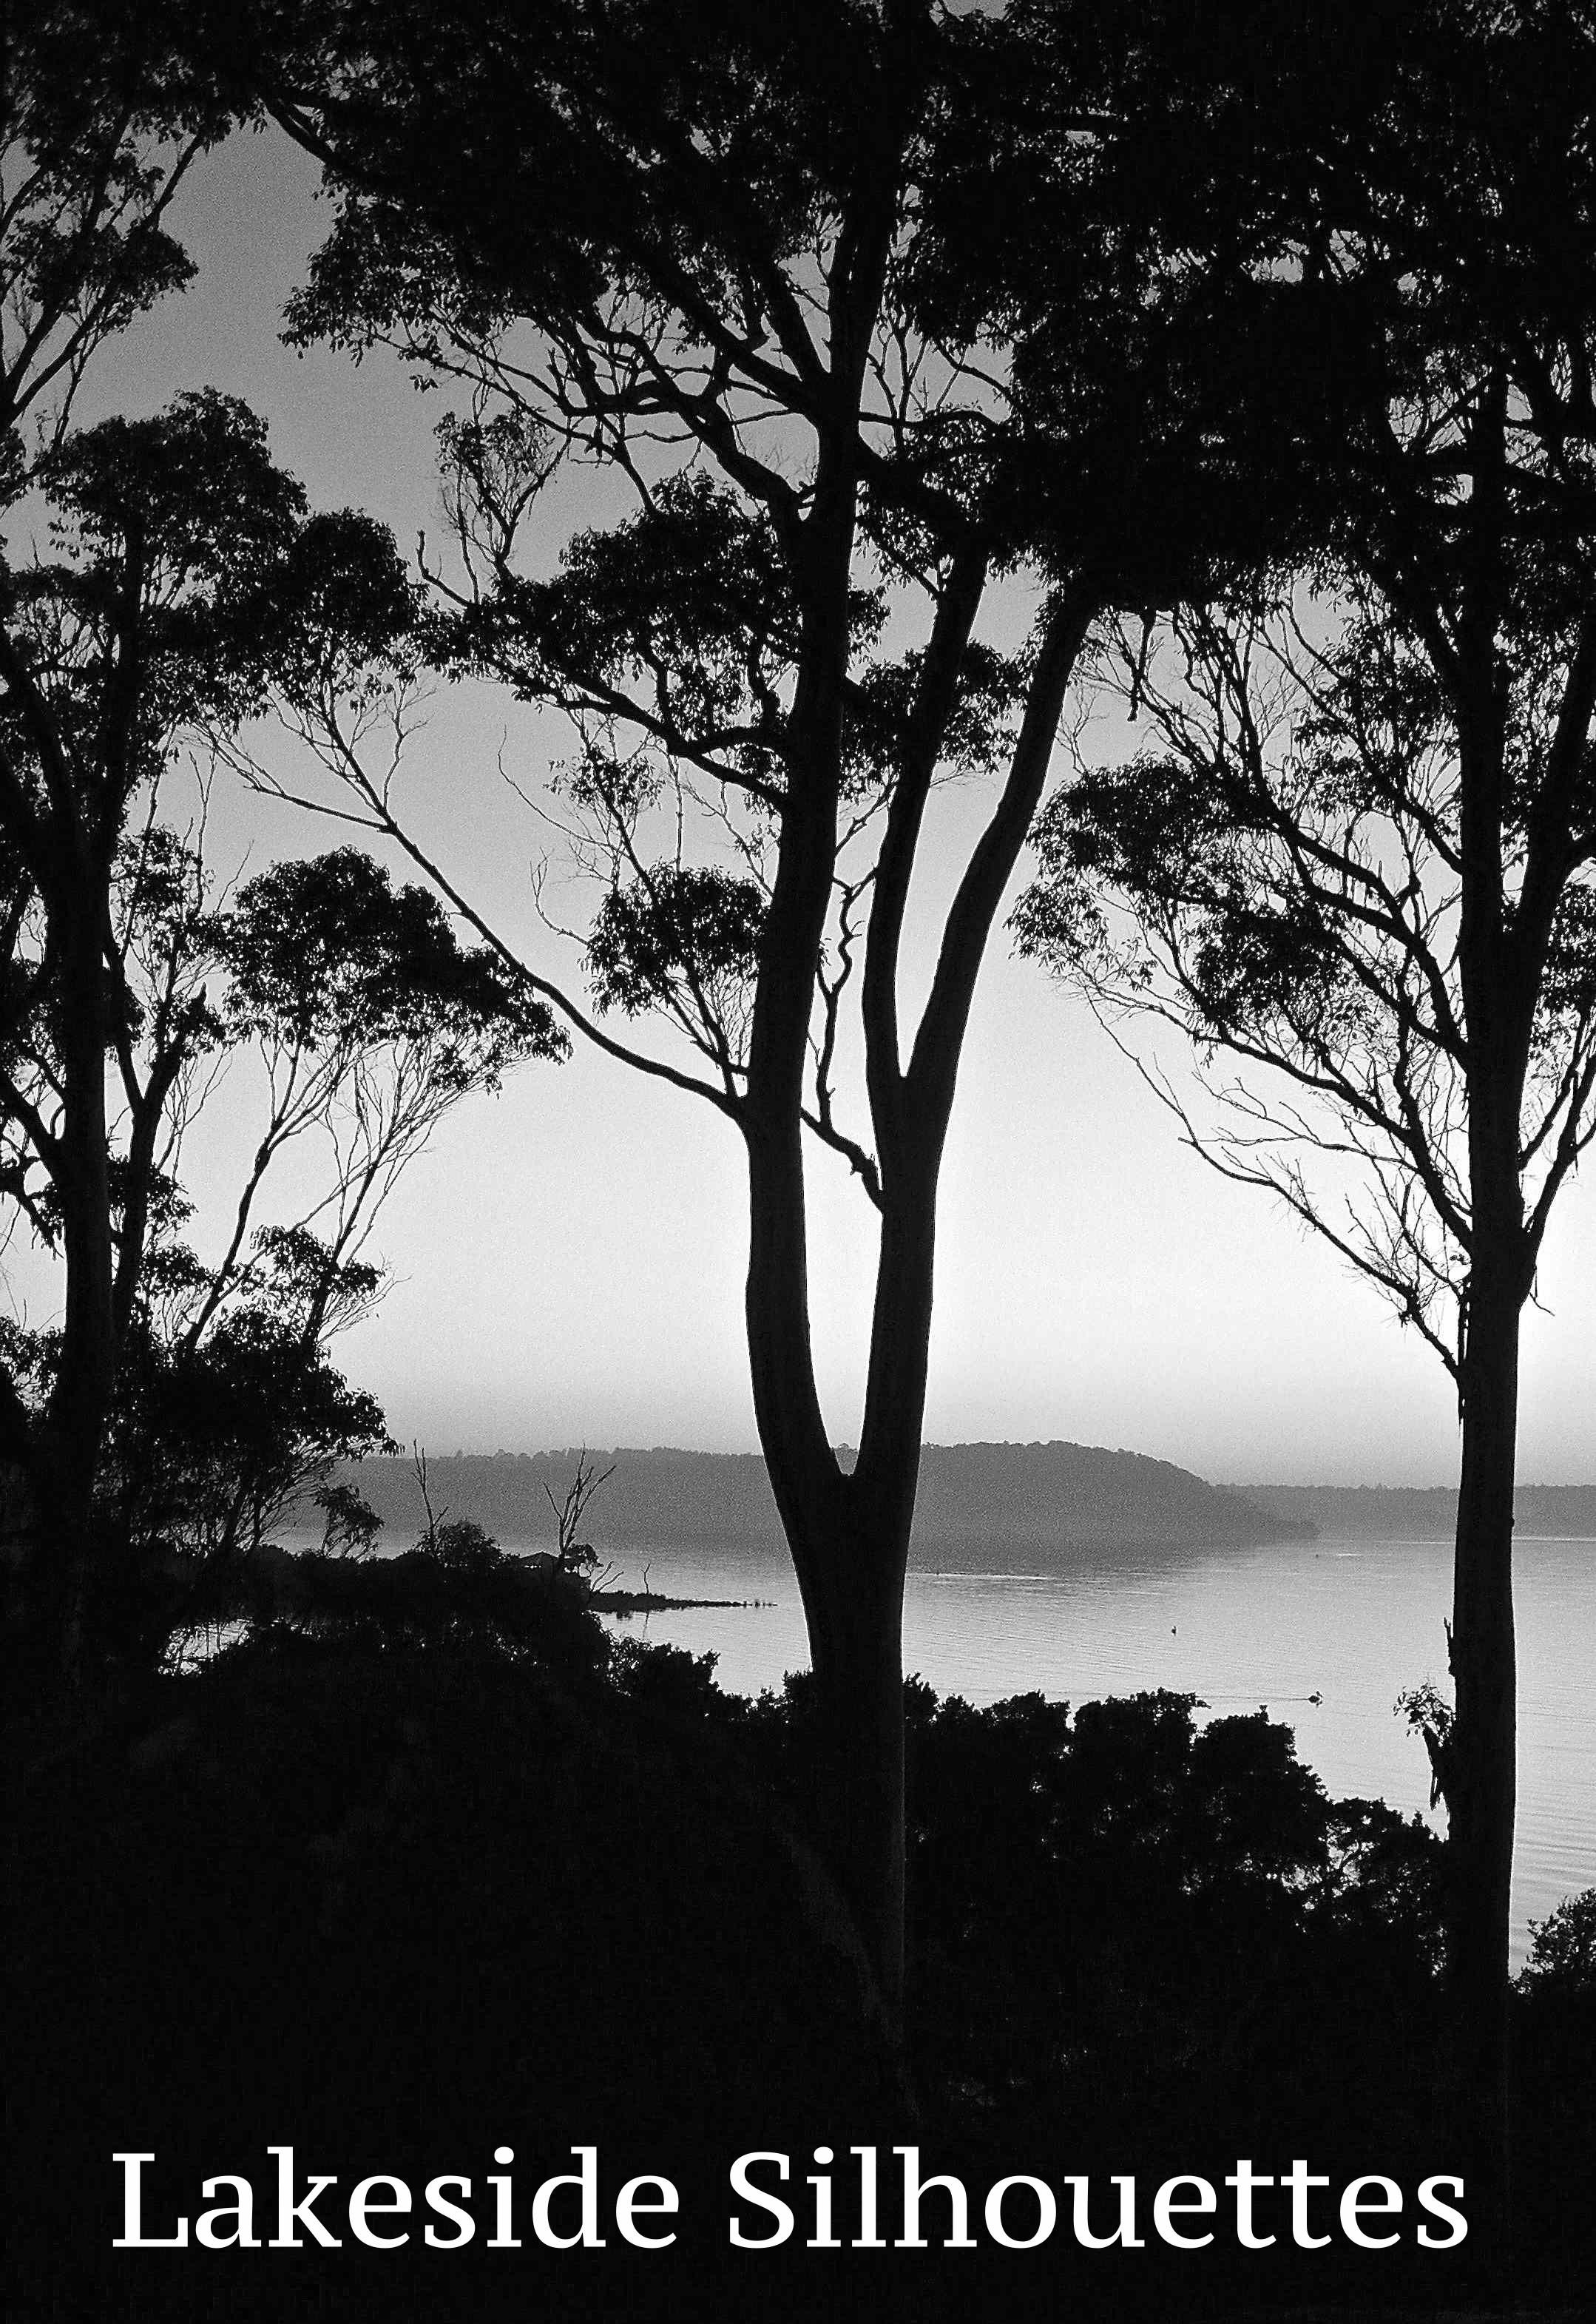 Lakeside silhouettes